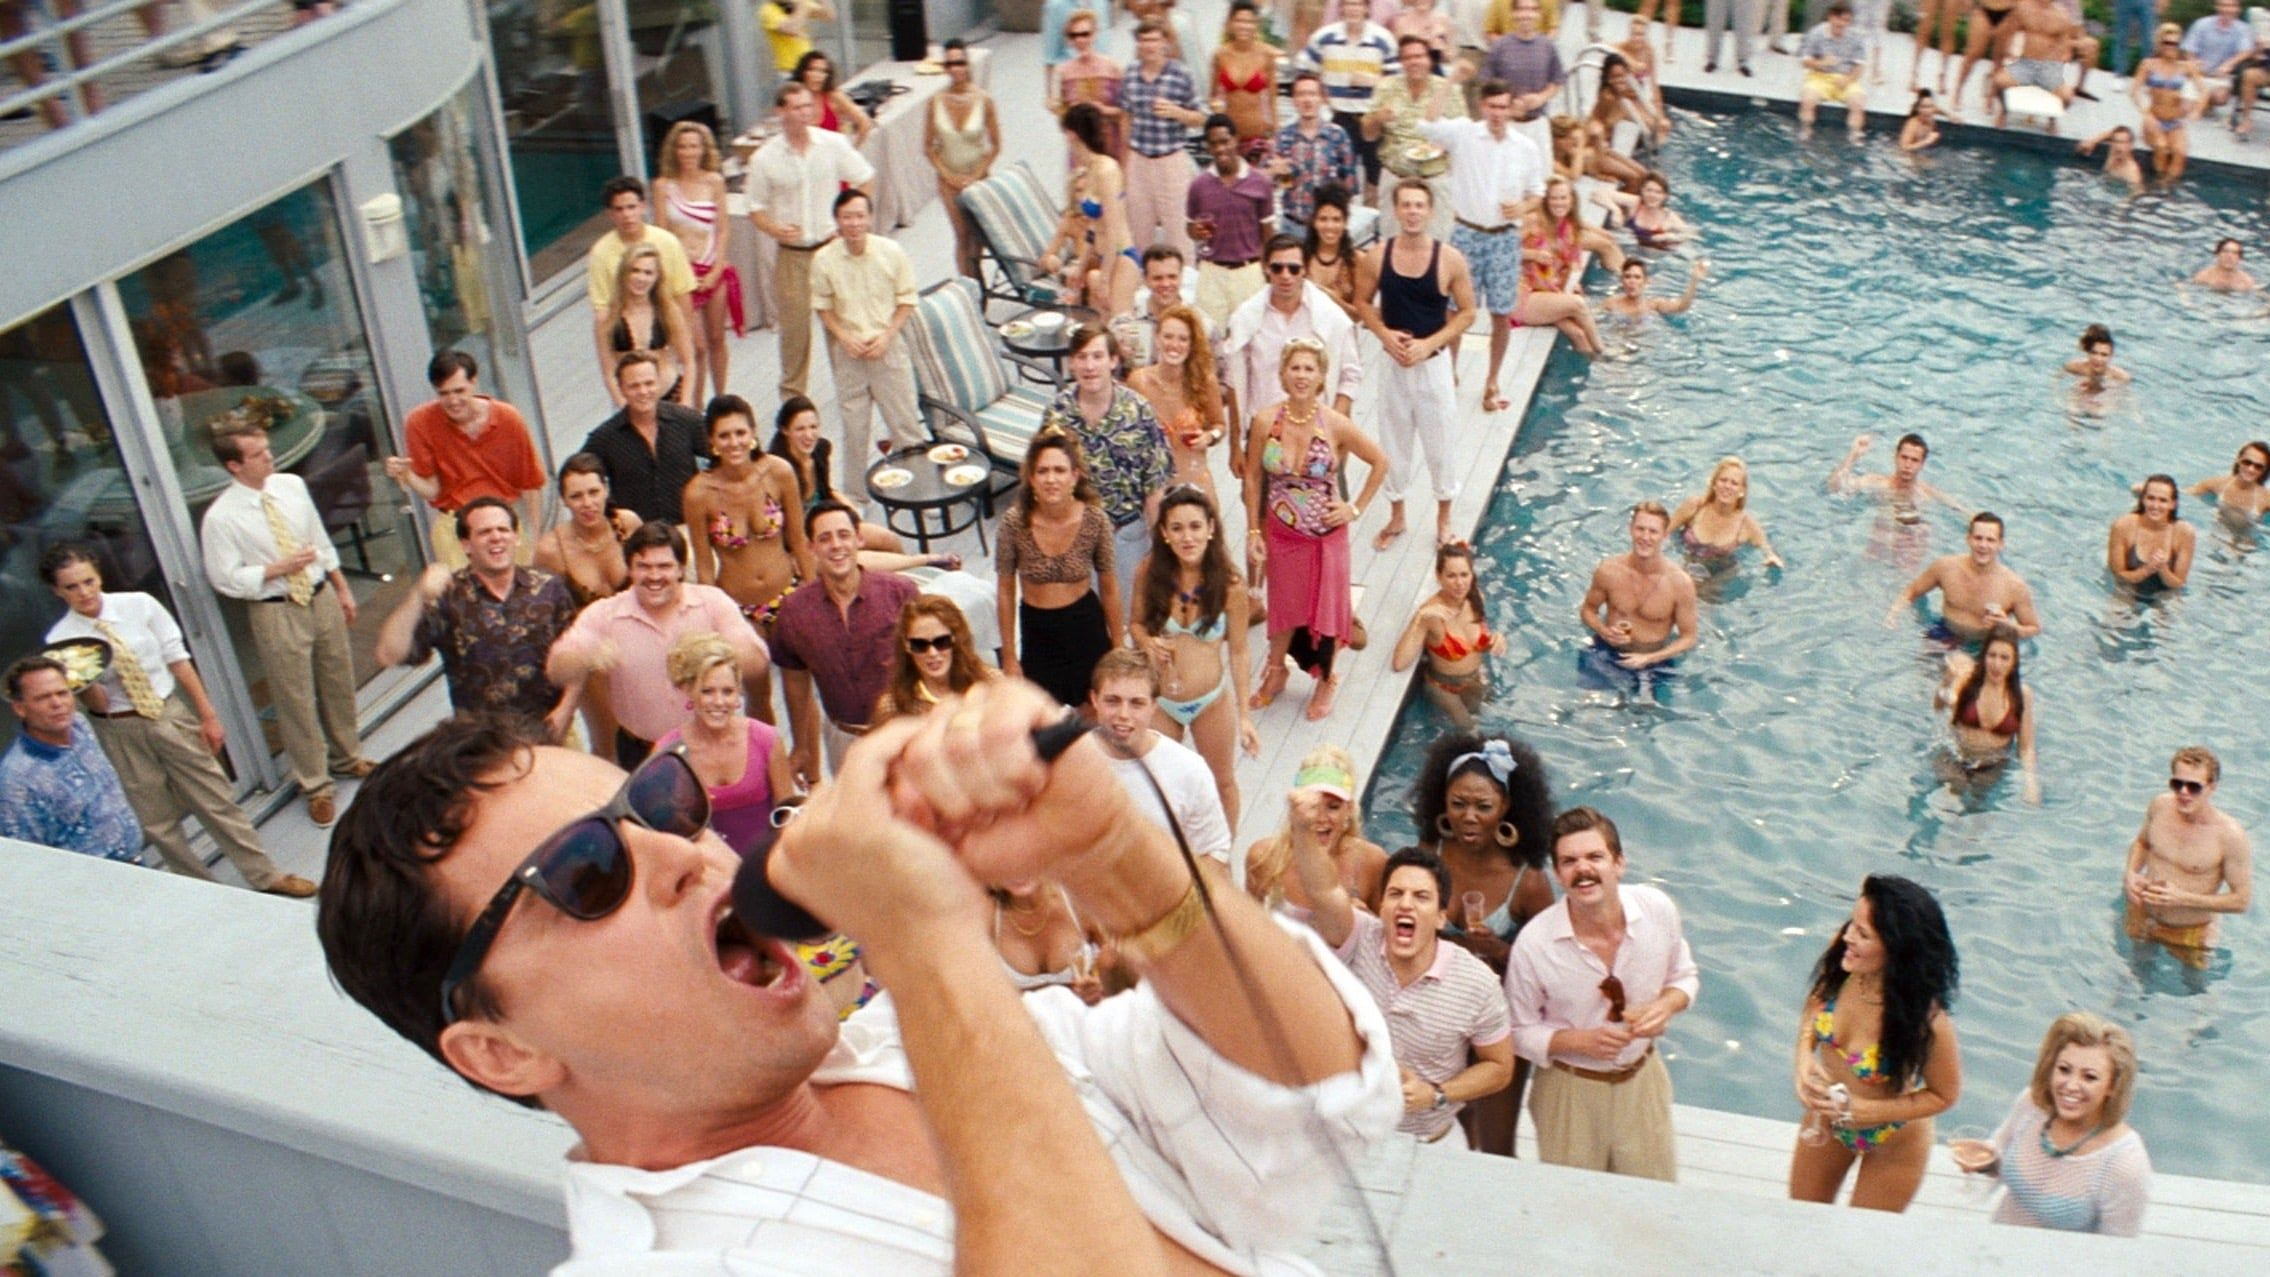 The Wolf Of Wall Street 2013 Ganzer Film Stream Deutsch Komplett Online The Wolf Of Wall Street 2013complete Film D Wolf Of Wall Street Wall Street Street Film